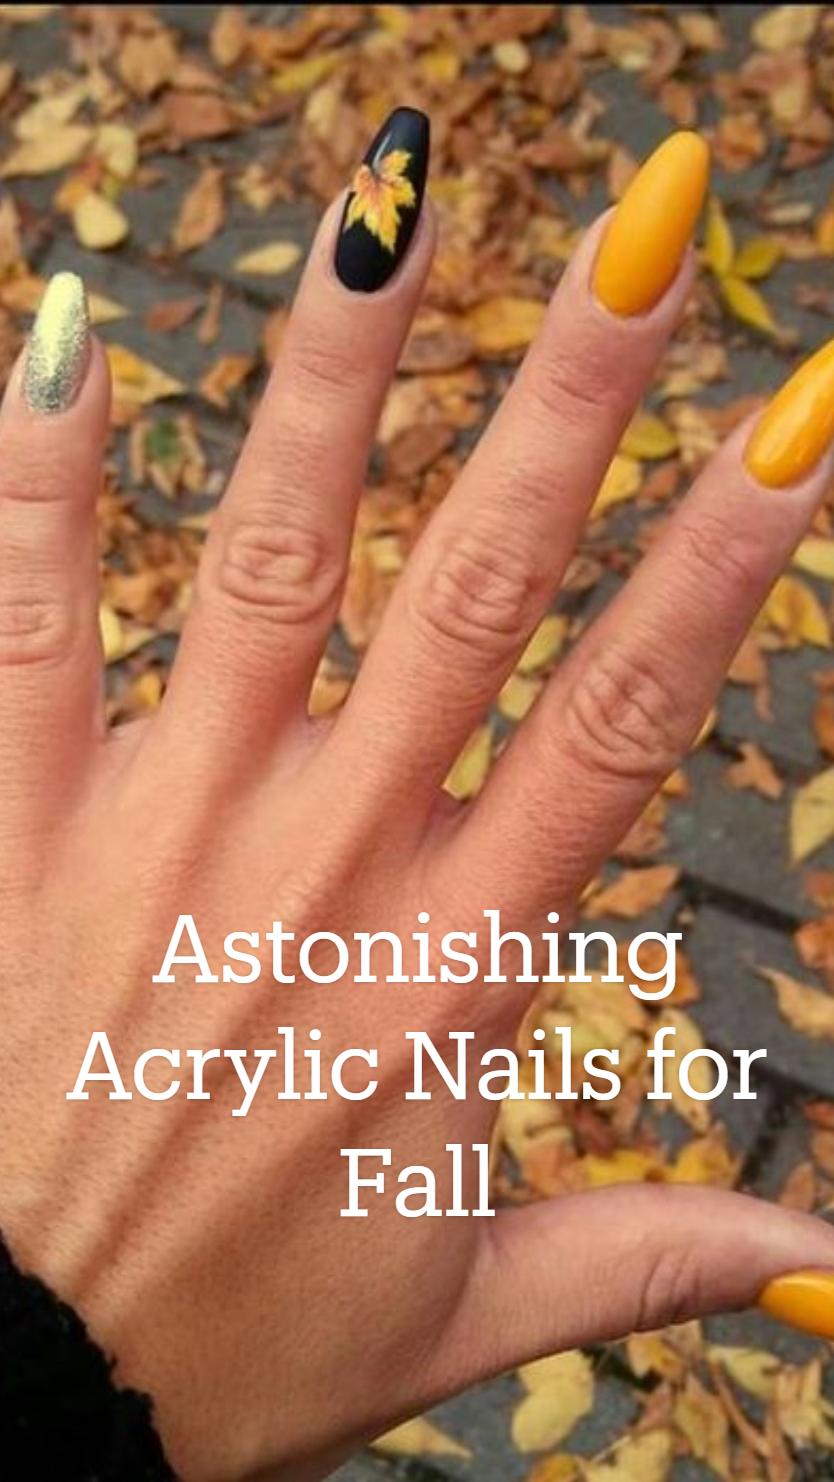 Astonishing Acrylic Nails for Fall